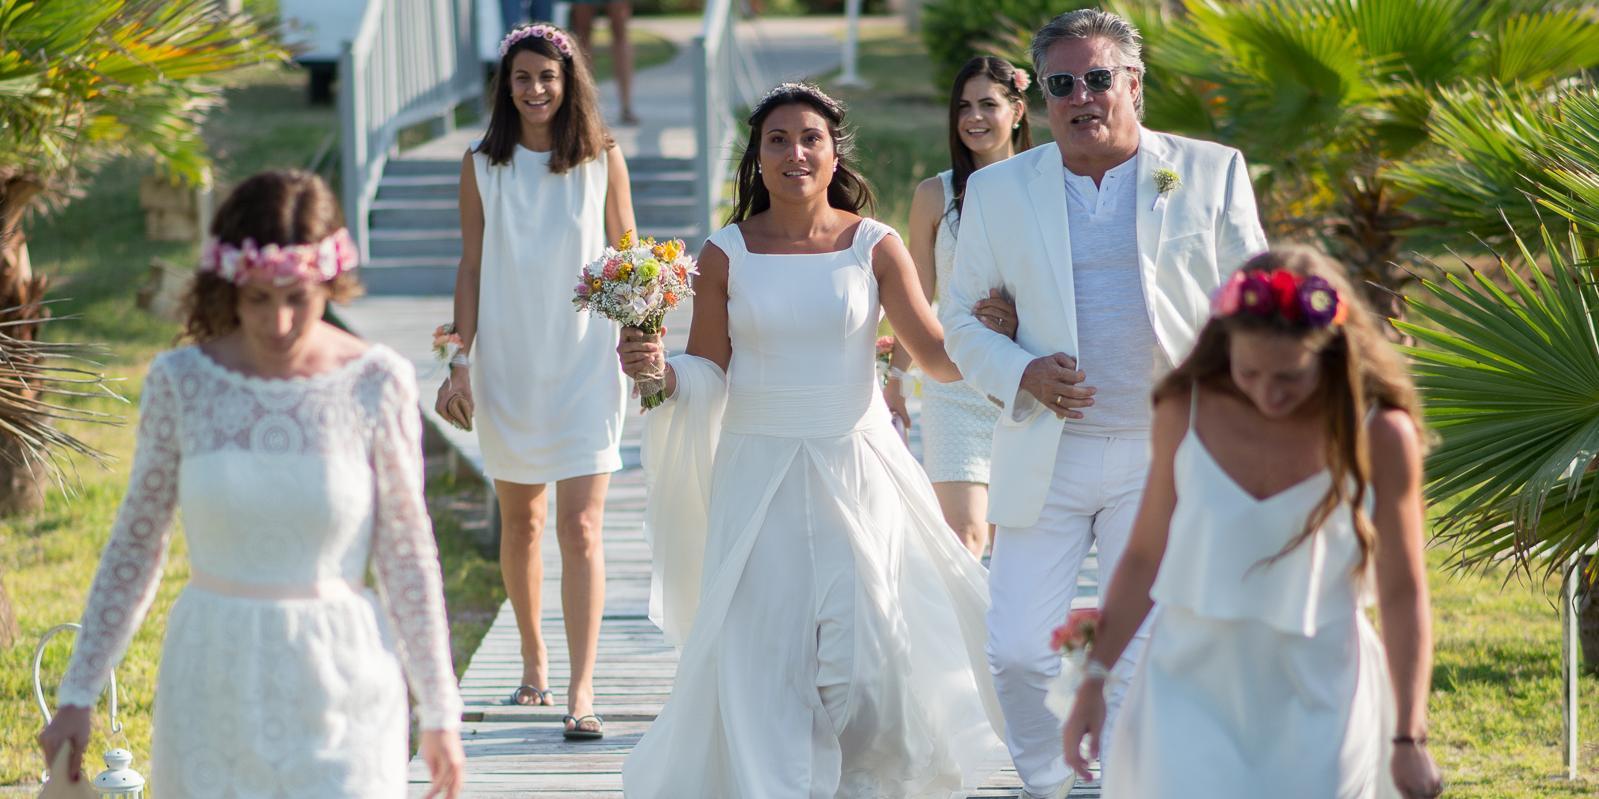 bodas-rustico-playa-cuba-6331.jpg